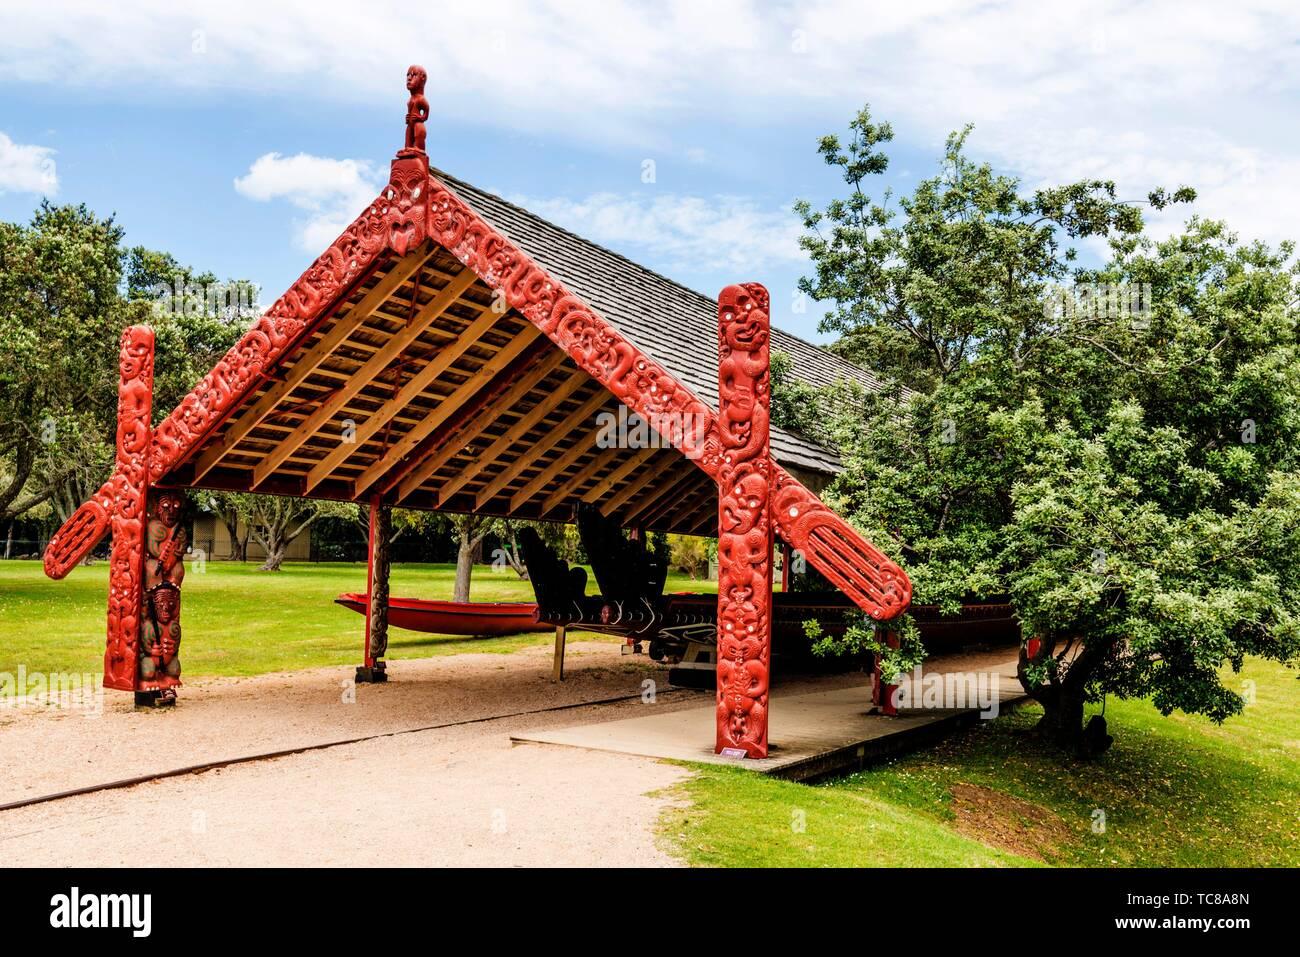 Maori canoe at the Waitangi Treaty Grounds, New Zealand. - Stock Image